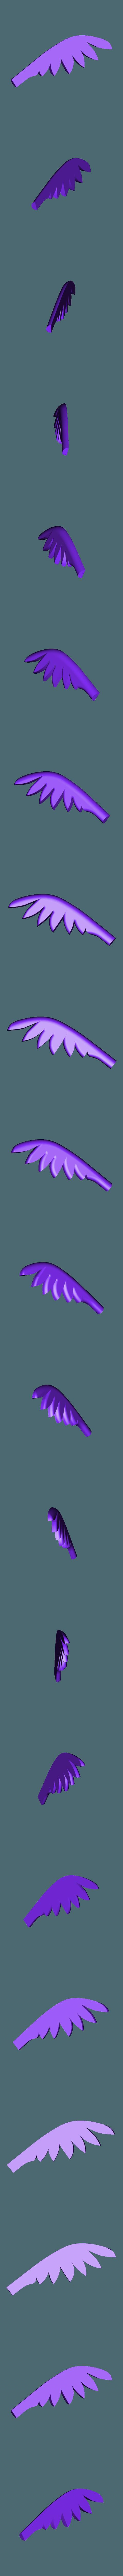 Wing_Left.stl Download free STL file Rainbow Toucan • 3D printing template, 3rdesignworks